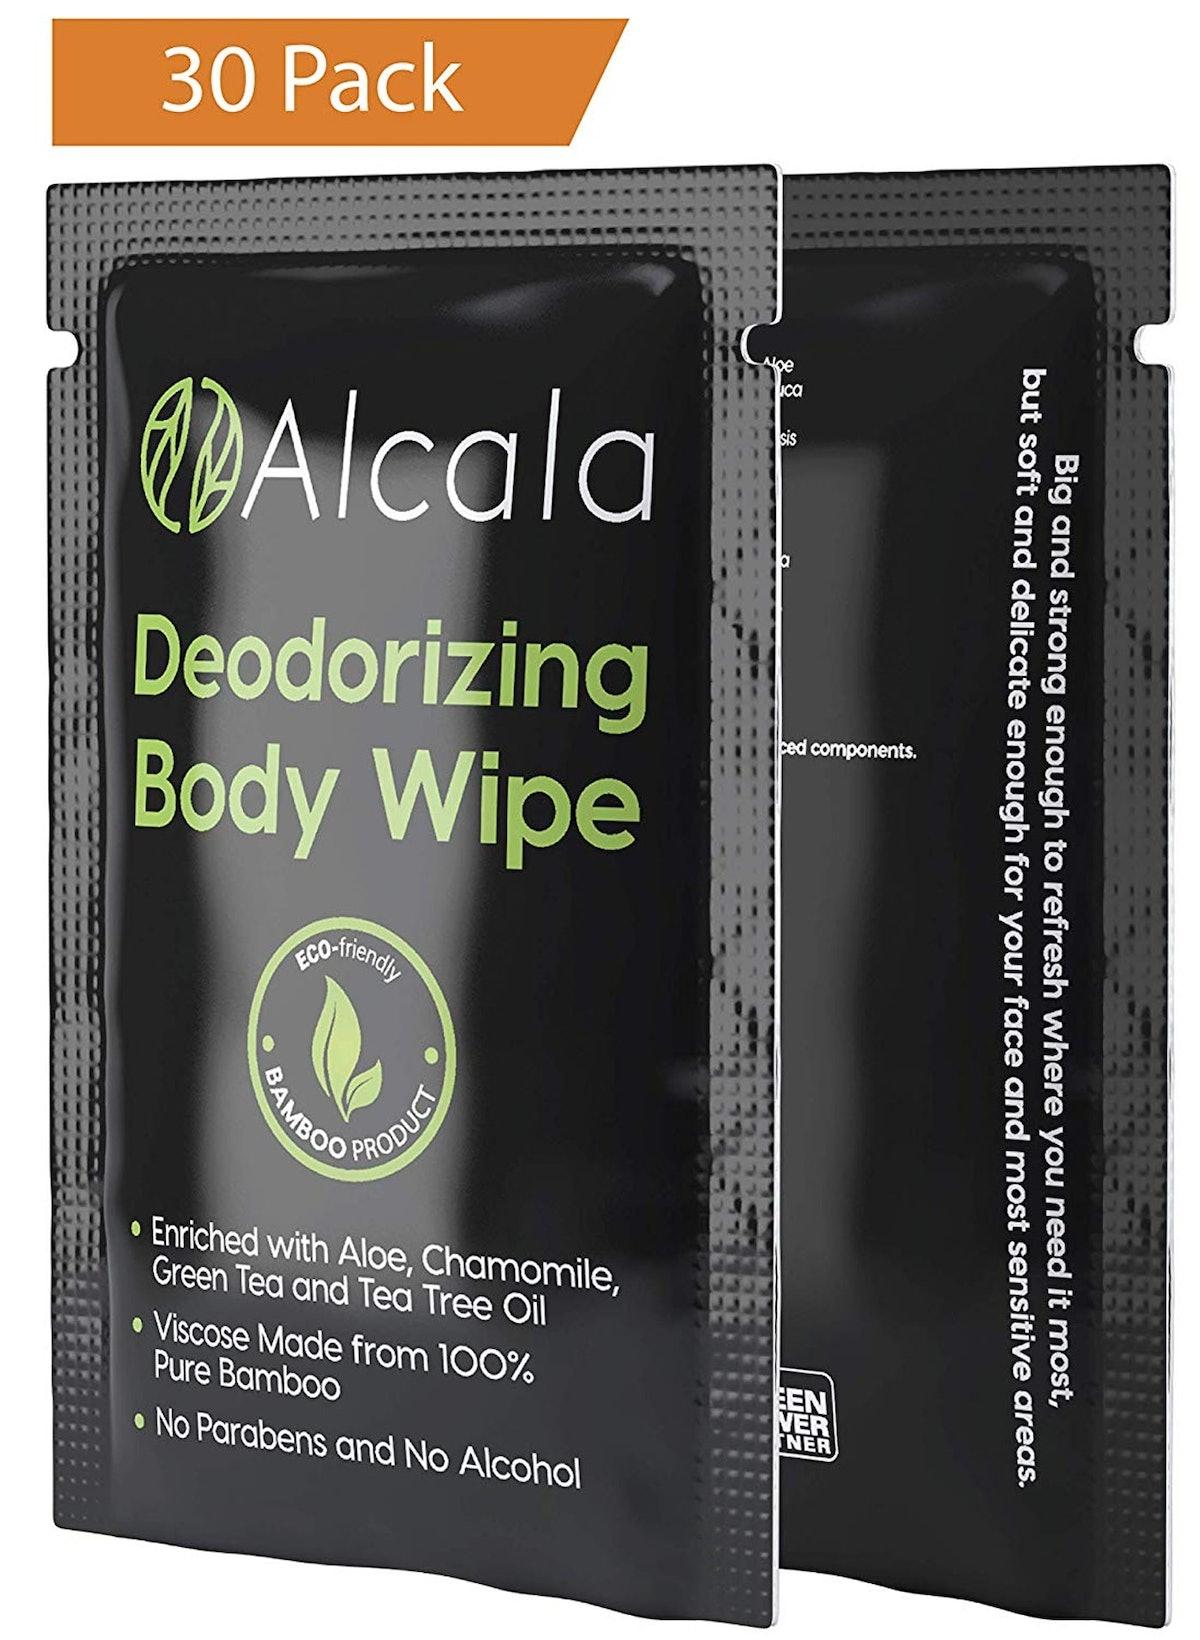 Alcala Deodorizing Body Wipes (30 Pack)